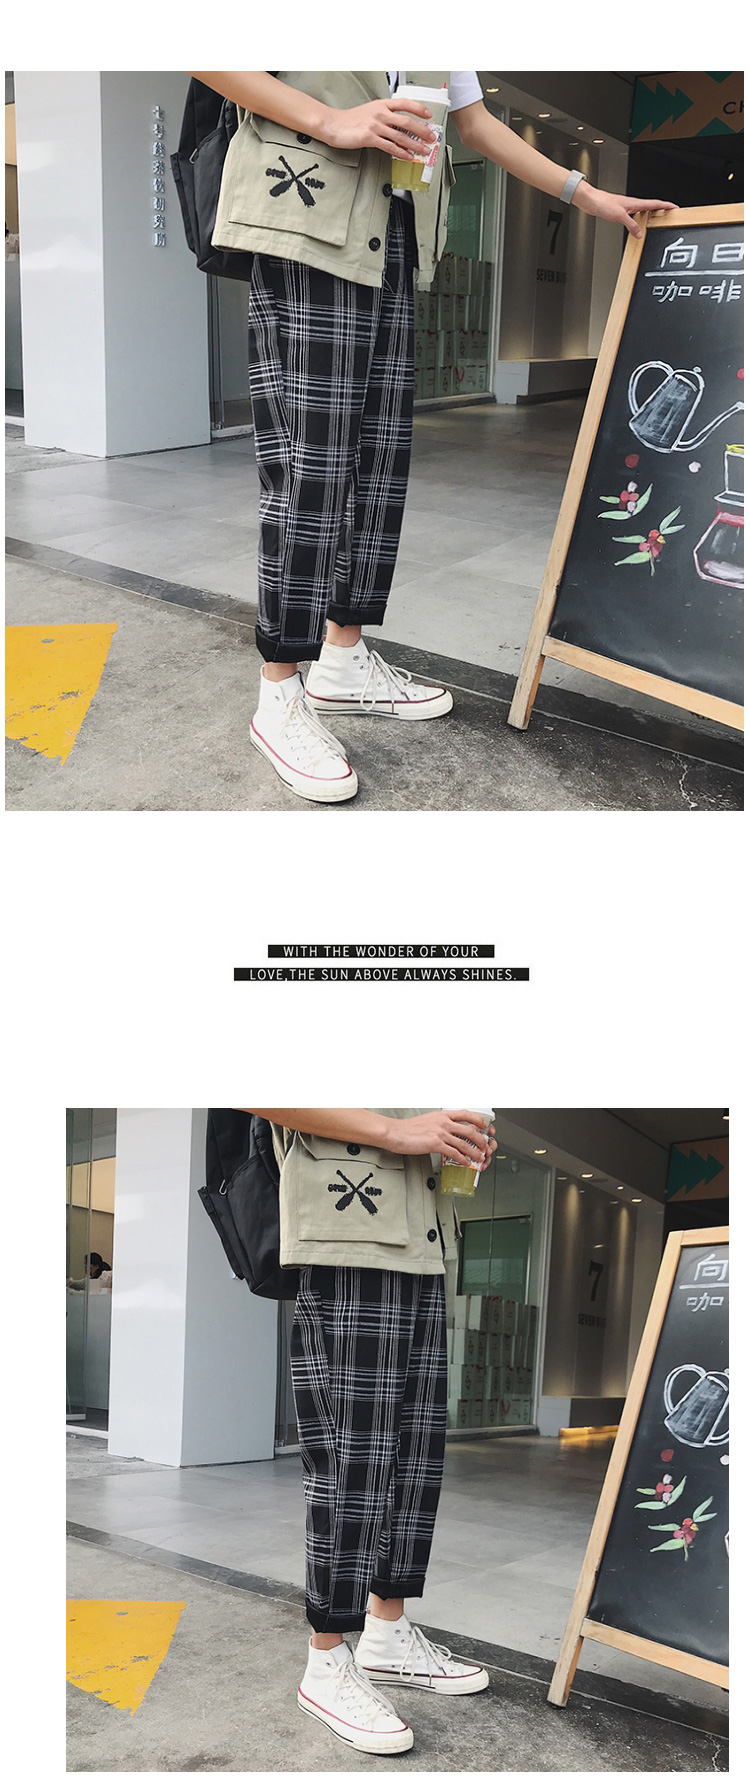 HTB1ri1qbsrrK1RjSspaq6AREXXaC LAPPSTER Streetwear Yellow Plaid Pants Men Joggers 2019 Man Casual Straight Harem Pants Men Korean Hip Hop Track Pants Plus Size